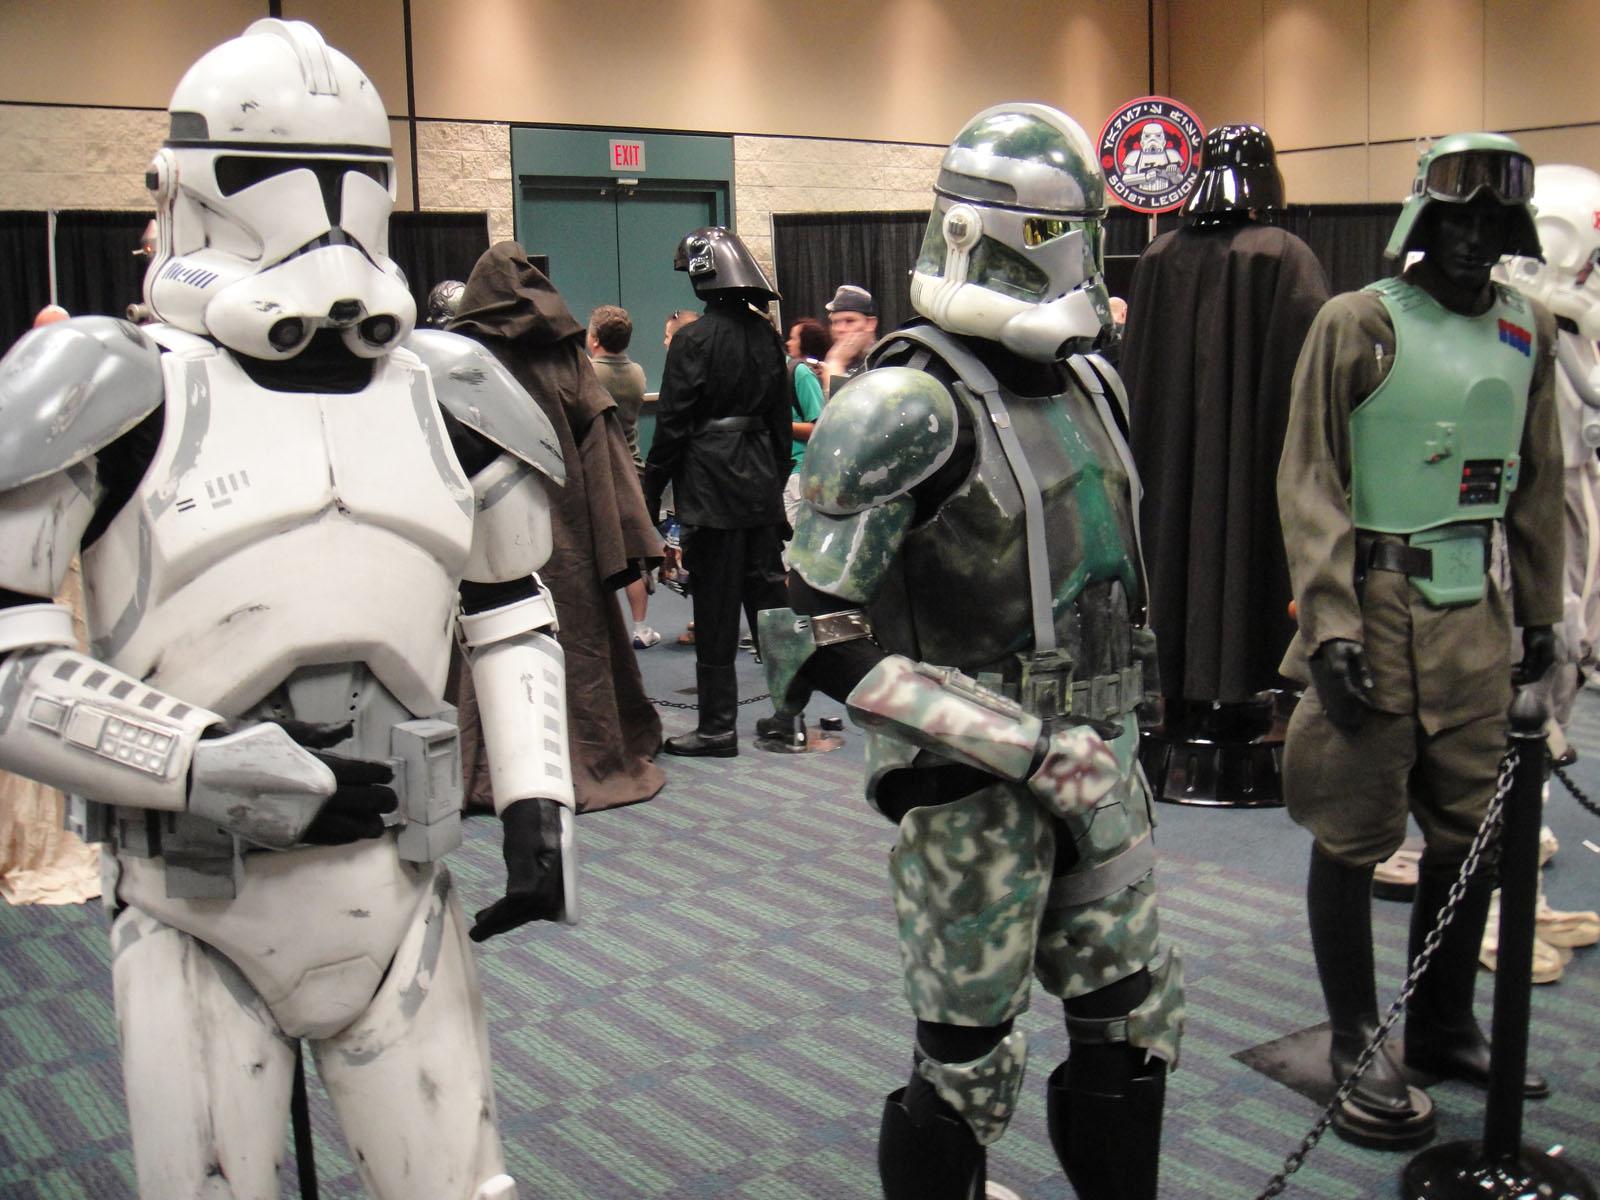 FileStar Wars Celebration V   501st room   clone trooper costumes 1600x1200